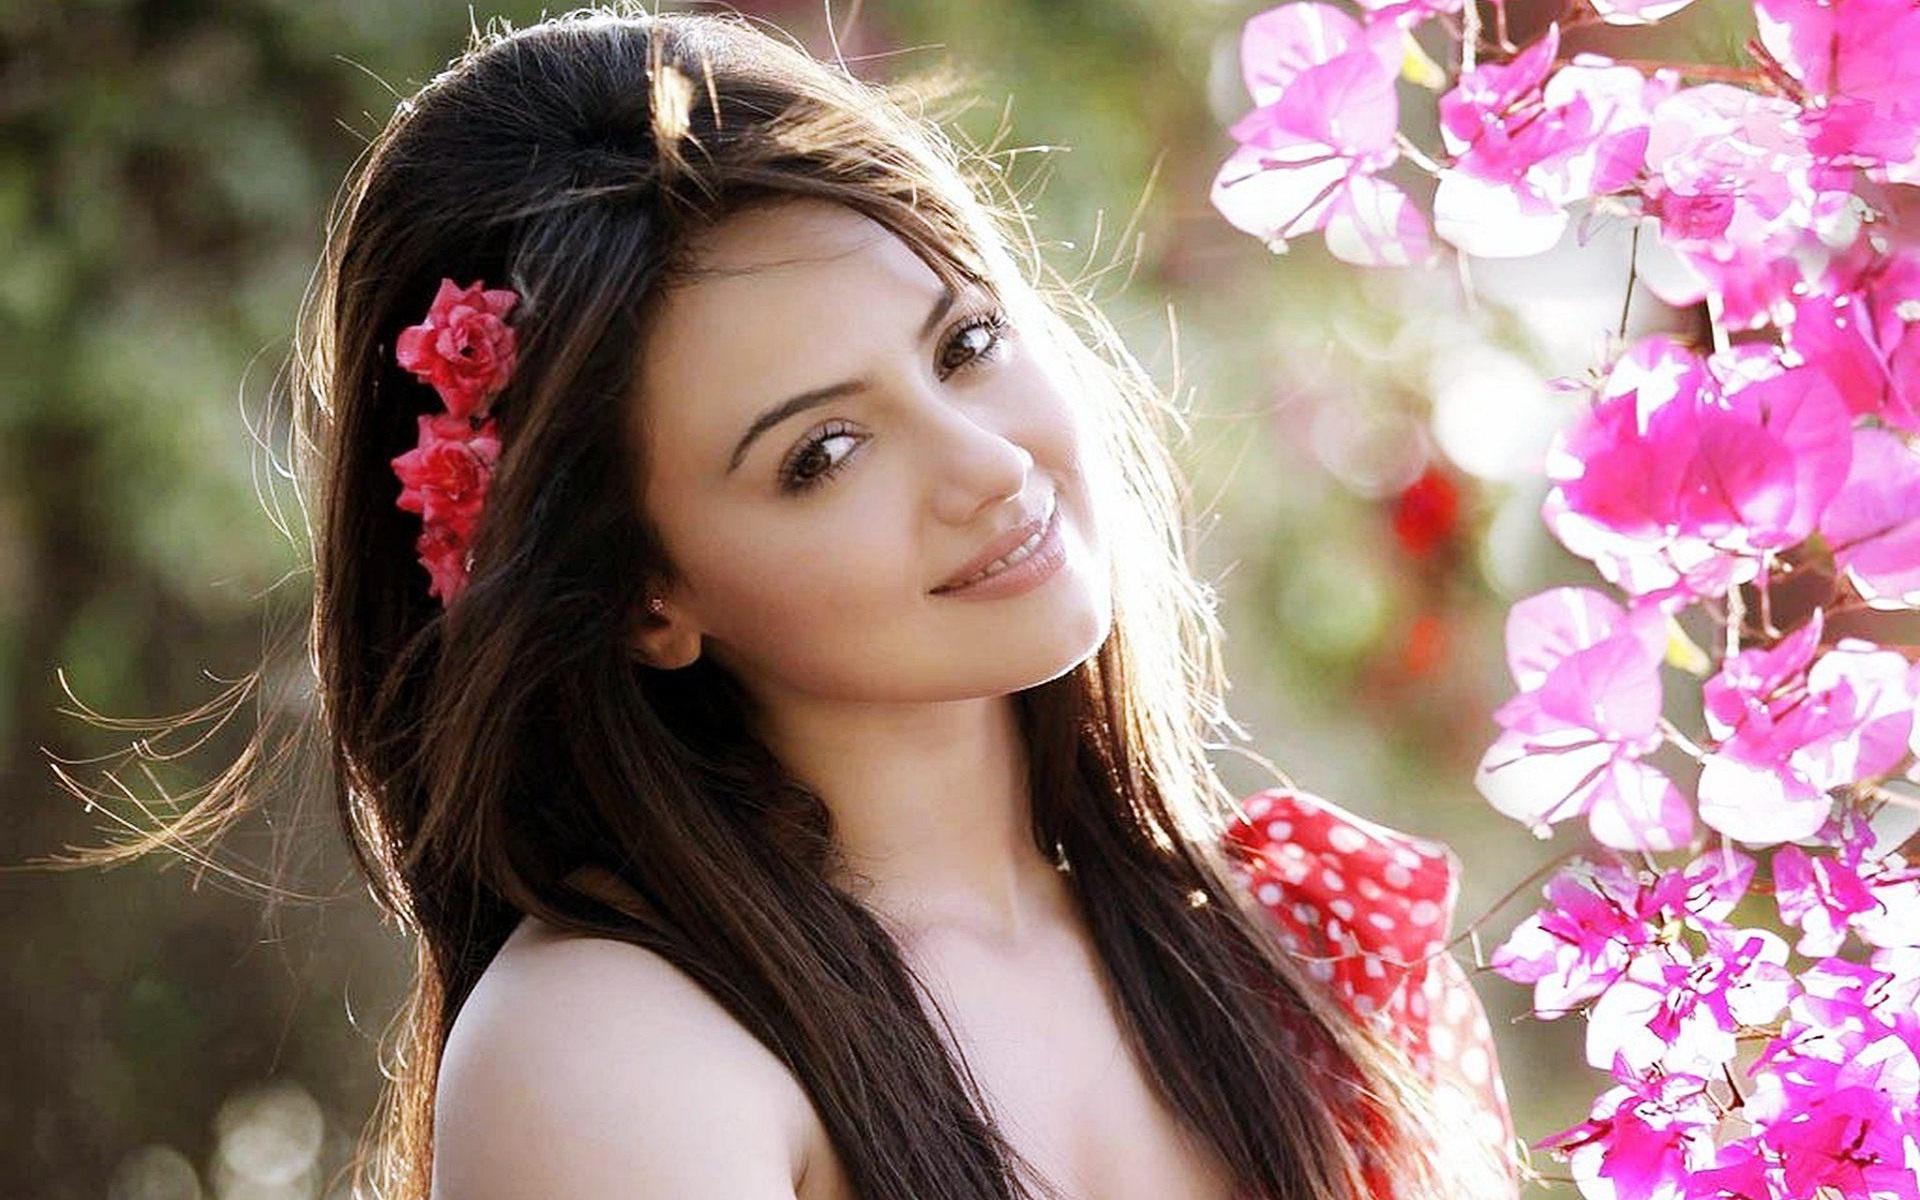 Indian Beautiful Girl Wallpapers Top Free Indian Beautiful Girl Backgrounds Wallpaperaccess